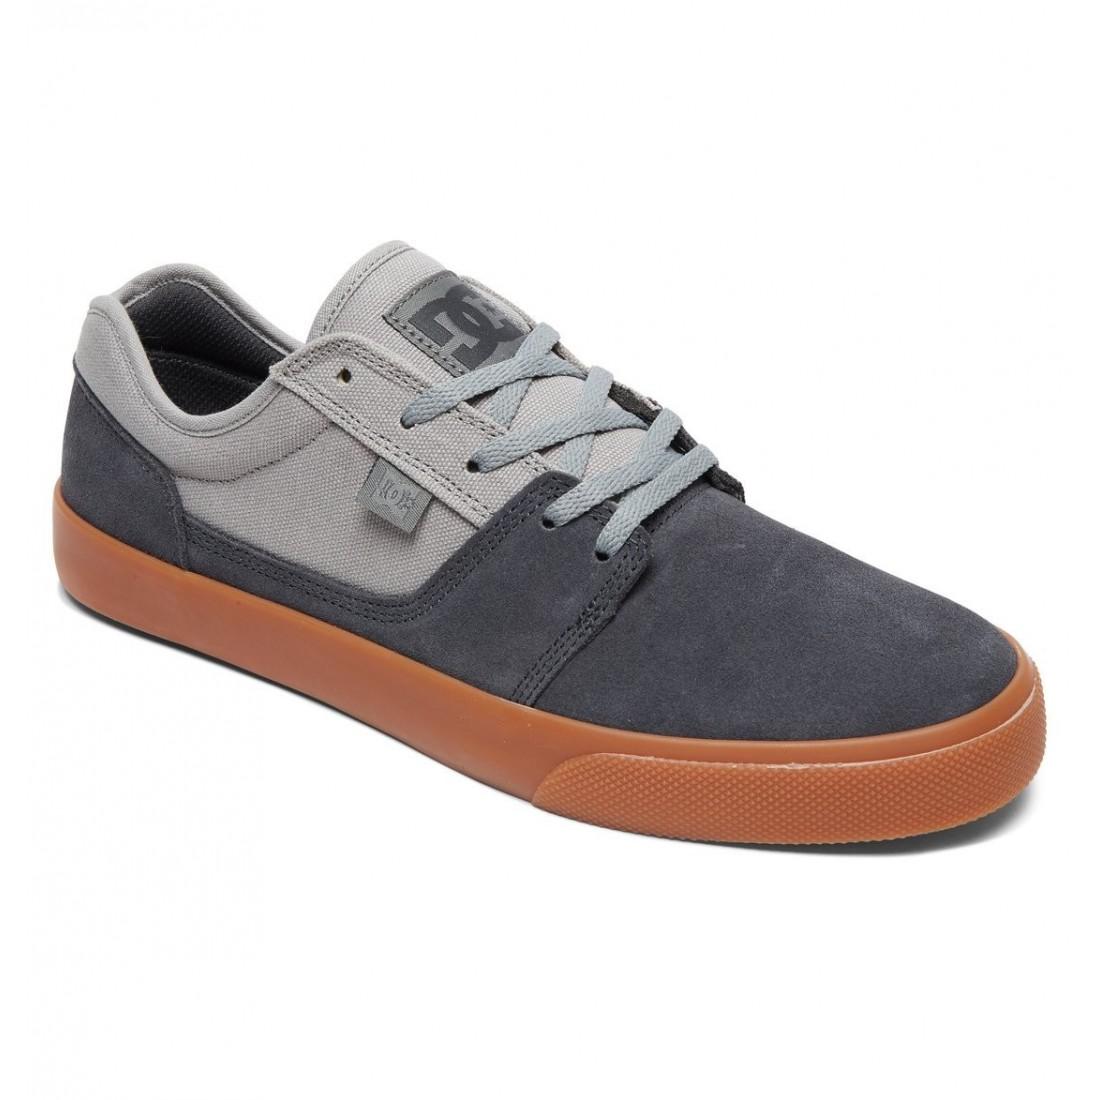 TONIK grey gum